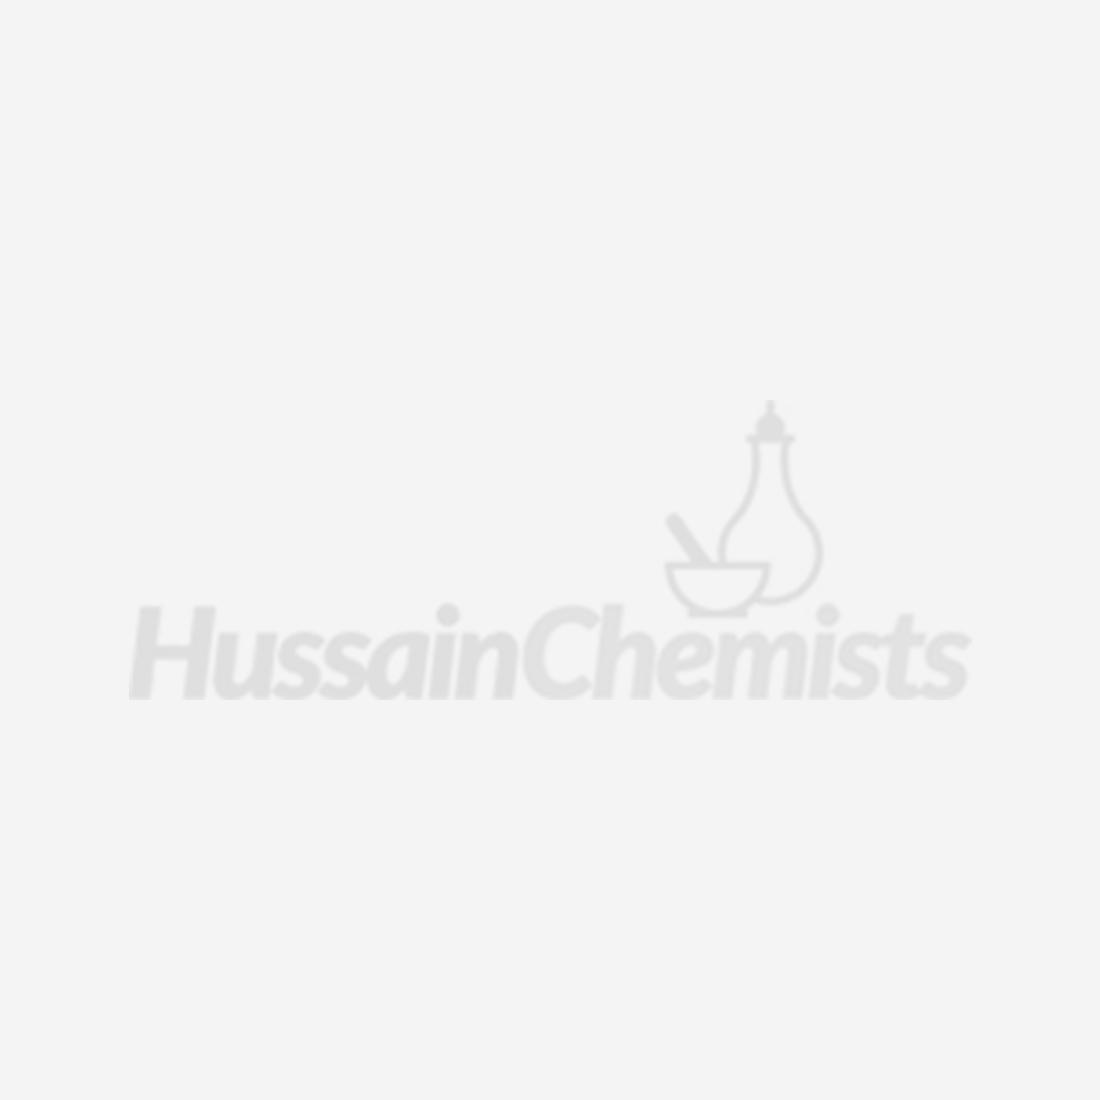 solpadeine plus soluble tablets - 32